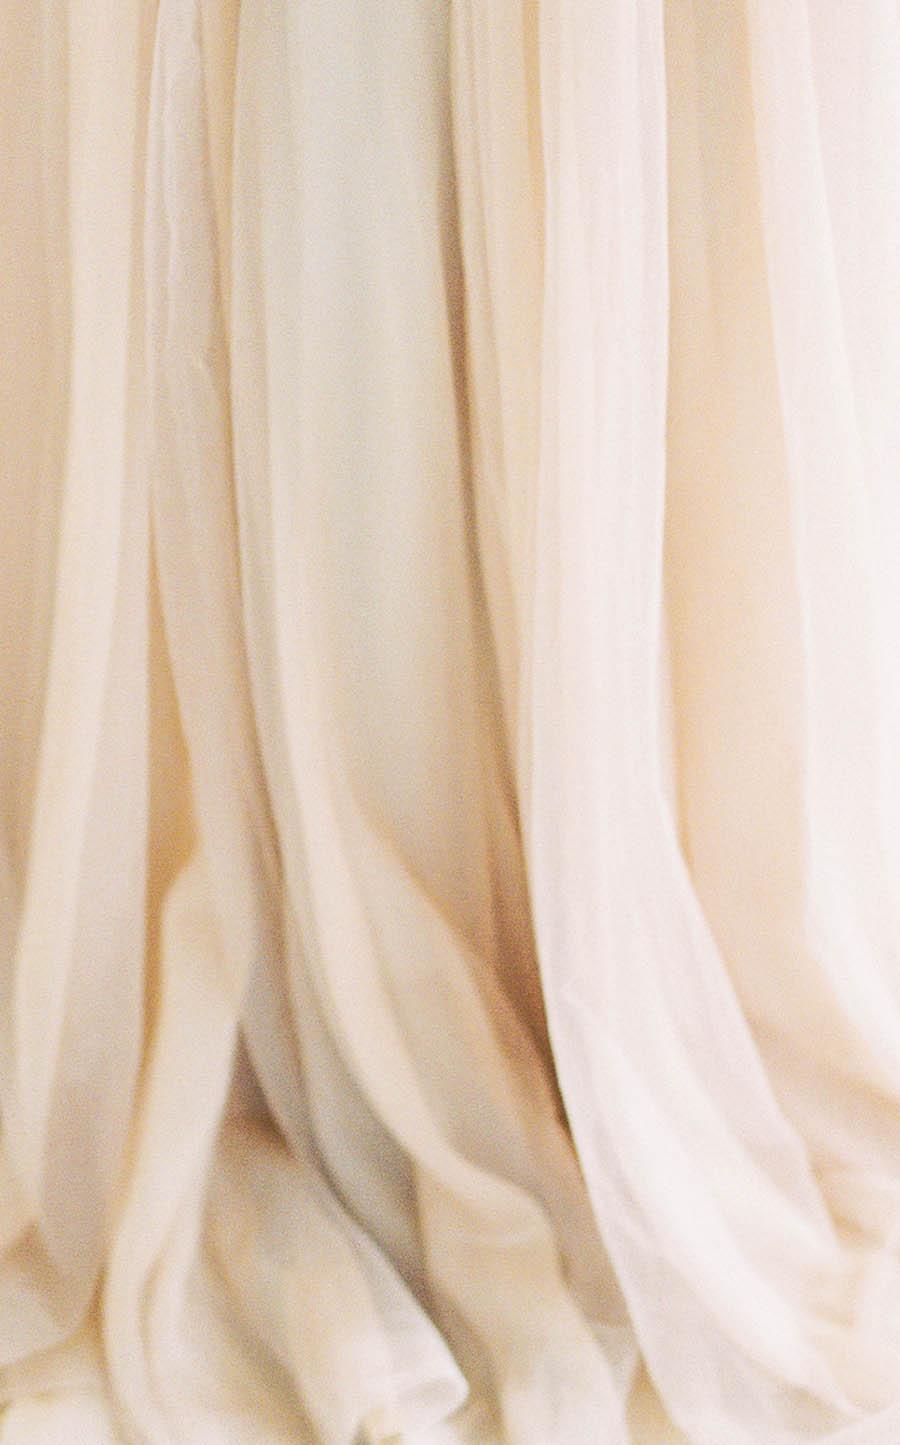 OTOGRAPHY_SHOP GOSSAMER_BUTTERFLY_LOS ANGELES WEDDING INSPIRATION-233.jpg